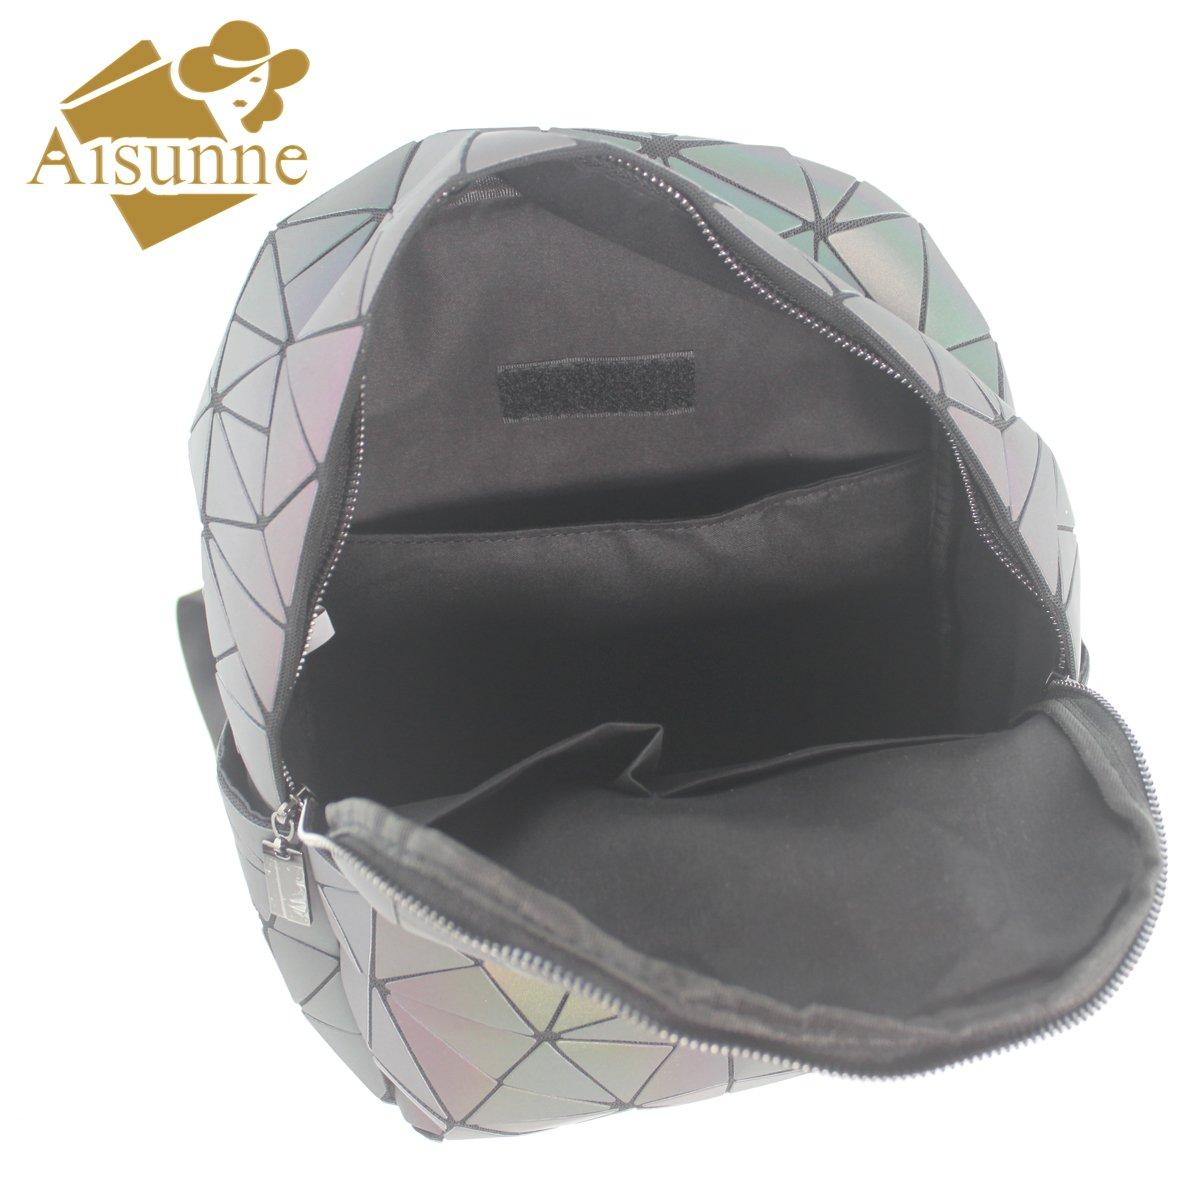 Aisunne Geometric Shard Lattice Luminous Backpack Handbags Leather Women Fashion shoulder Backpack